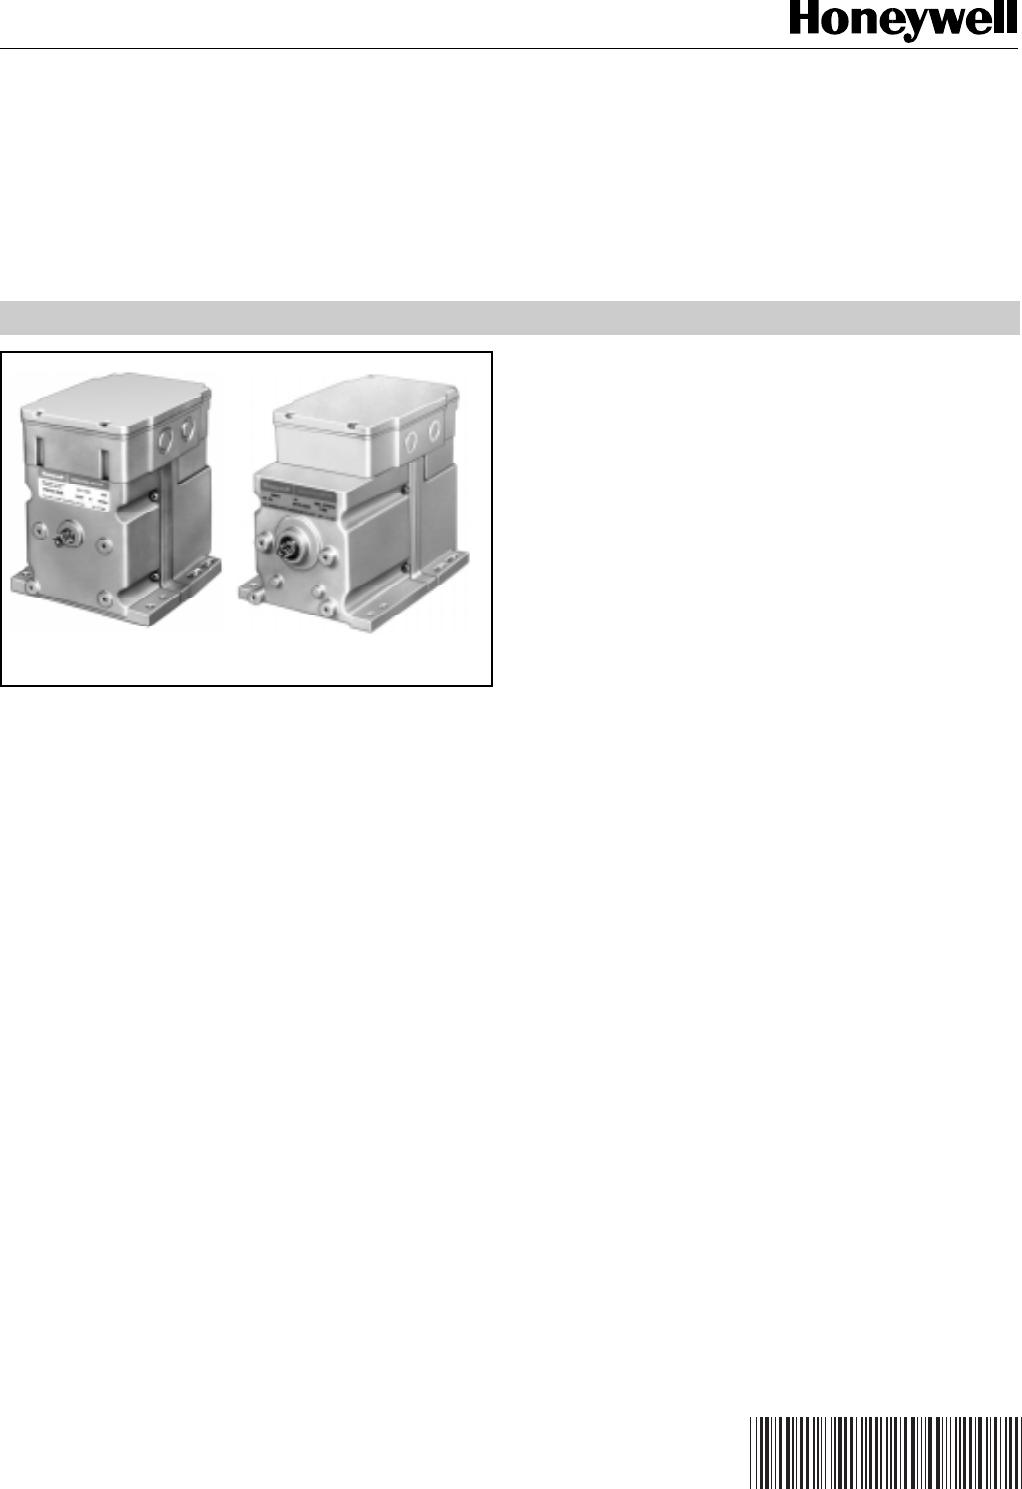 63 1166 m7281 m7282 m7284 m7285 m7294 modutrol 4 motors 63 1166 m7281 m7282 m7284 m7285 m7294 modutrol 4 motors 1000398363 catalog cheapraybanclubmaster Images